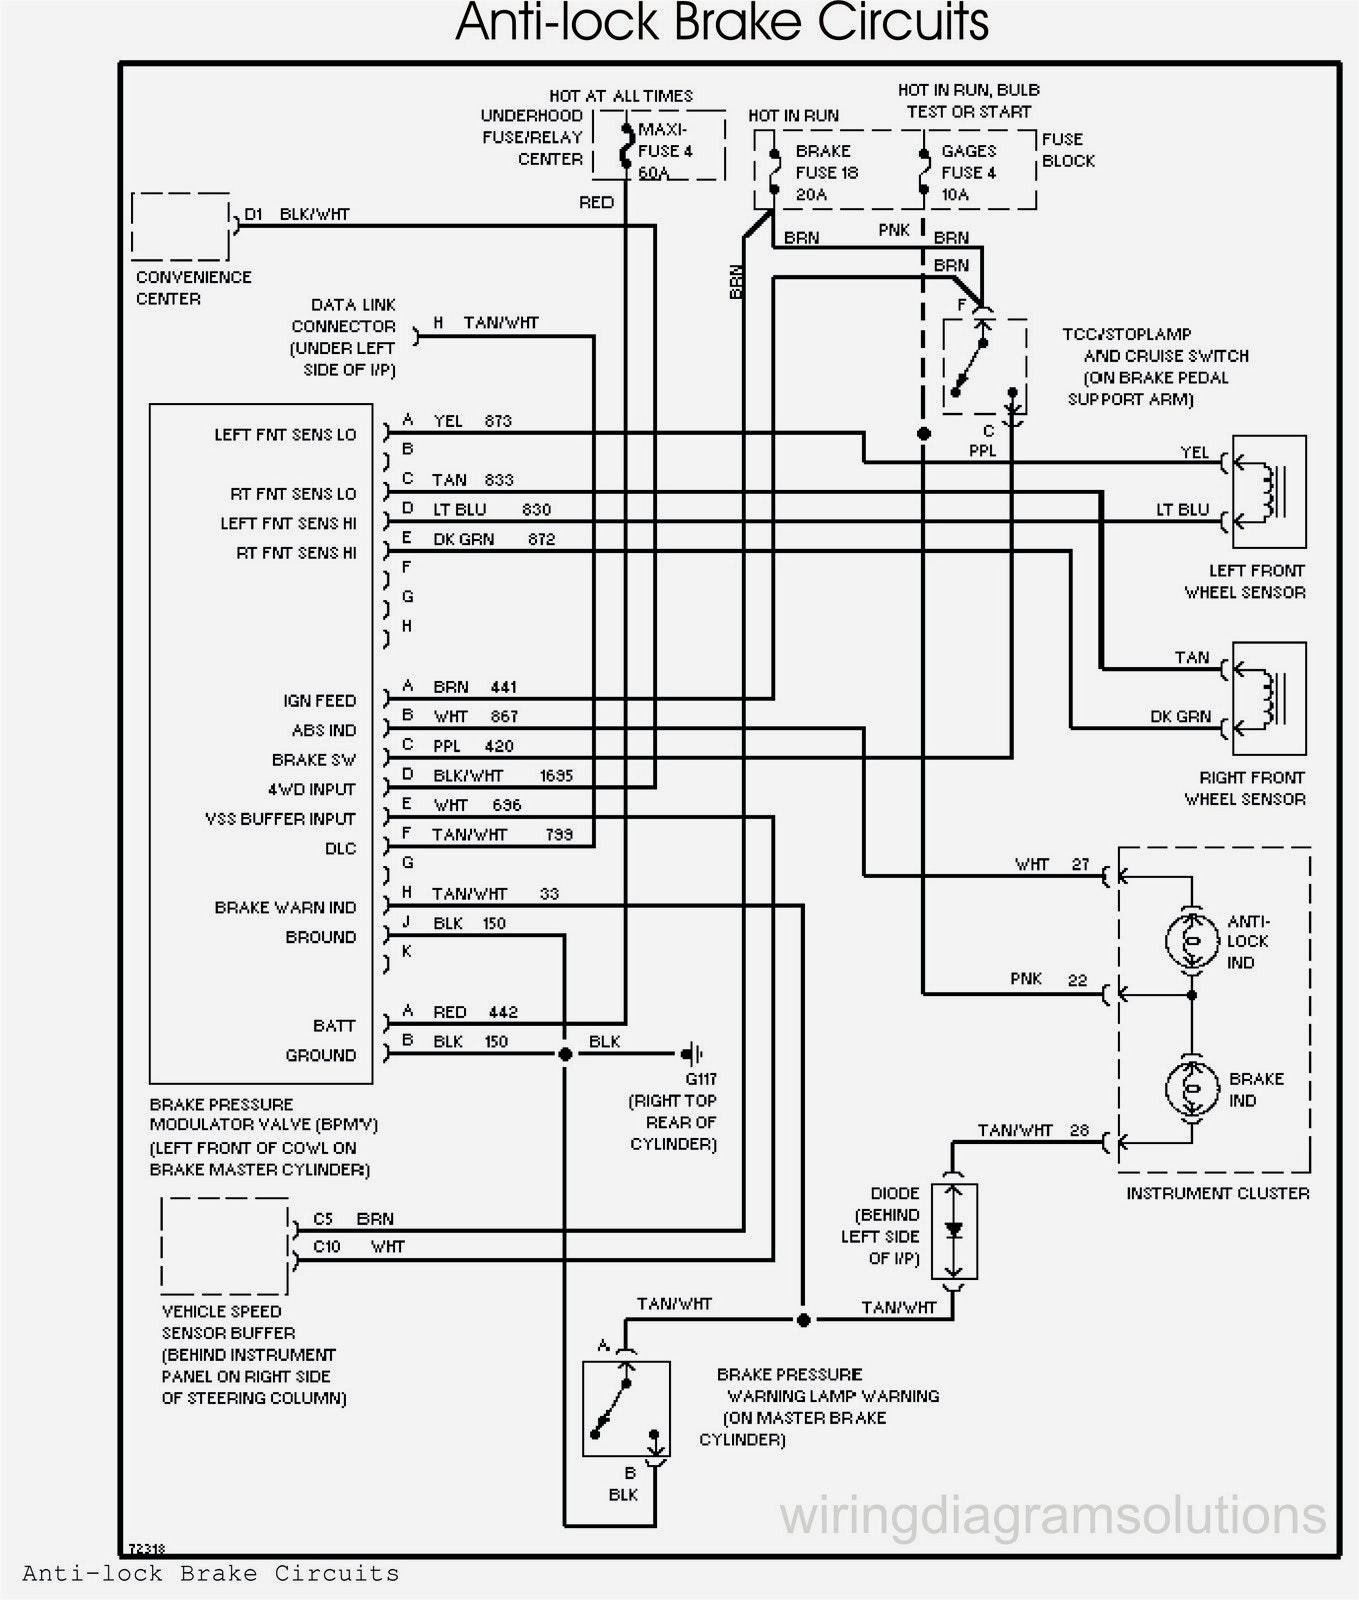 Voyager Backup Camera Wiring Diagram | Best Wiring Library - Voyager Backup Camera Wiring Diagram